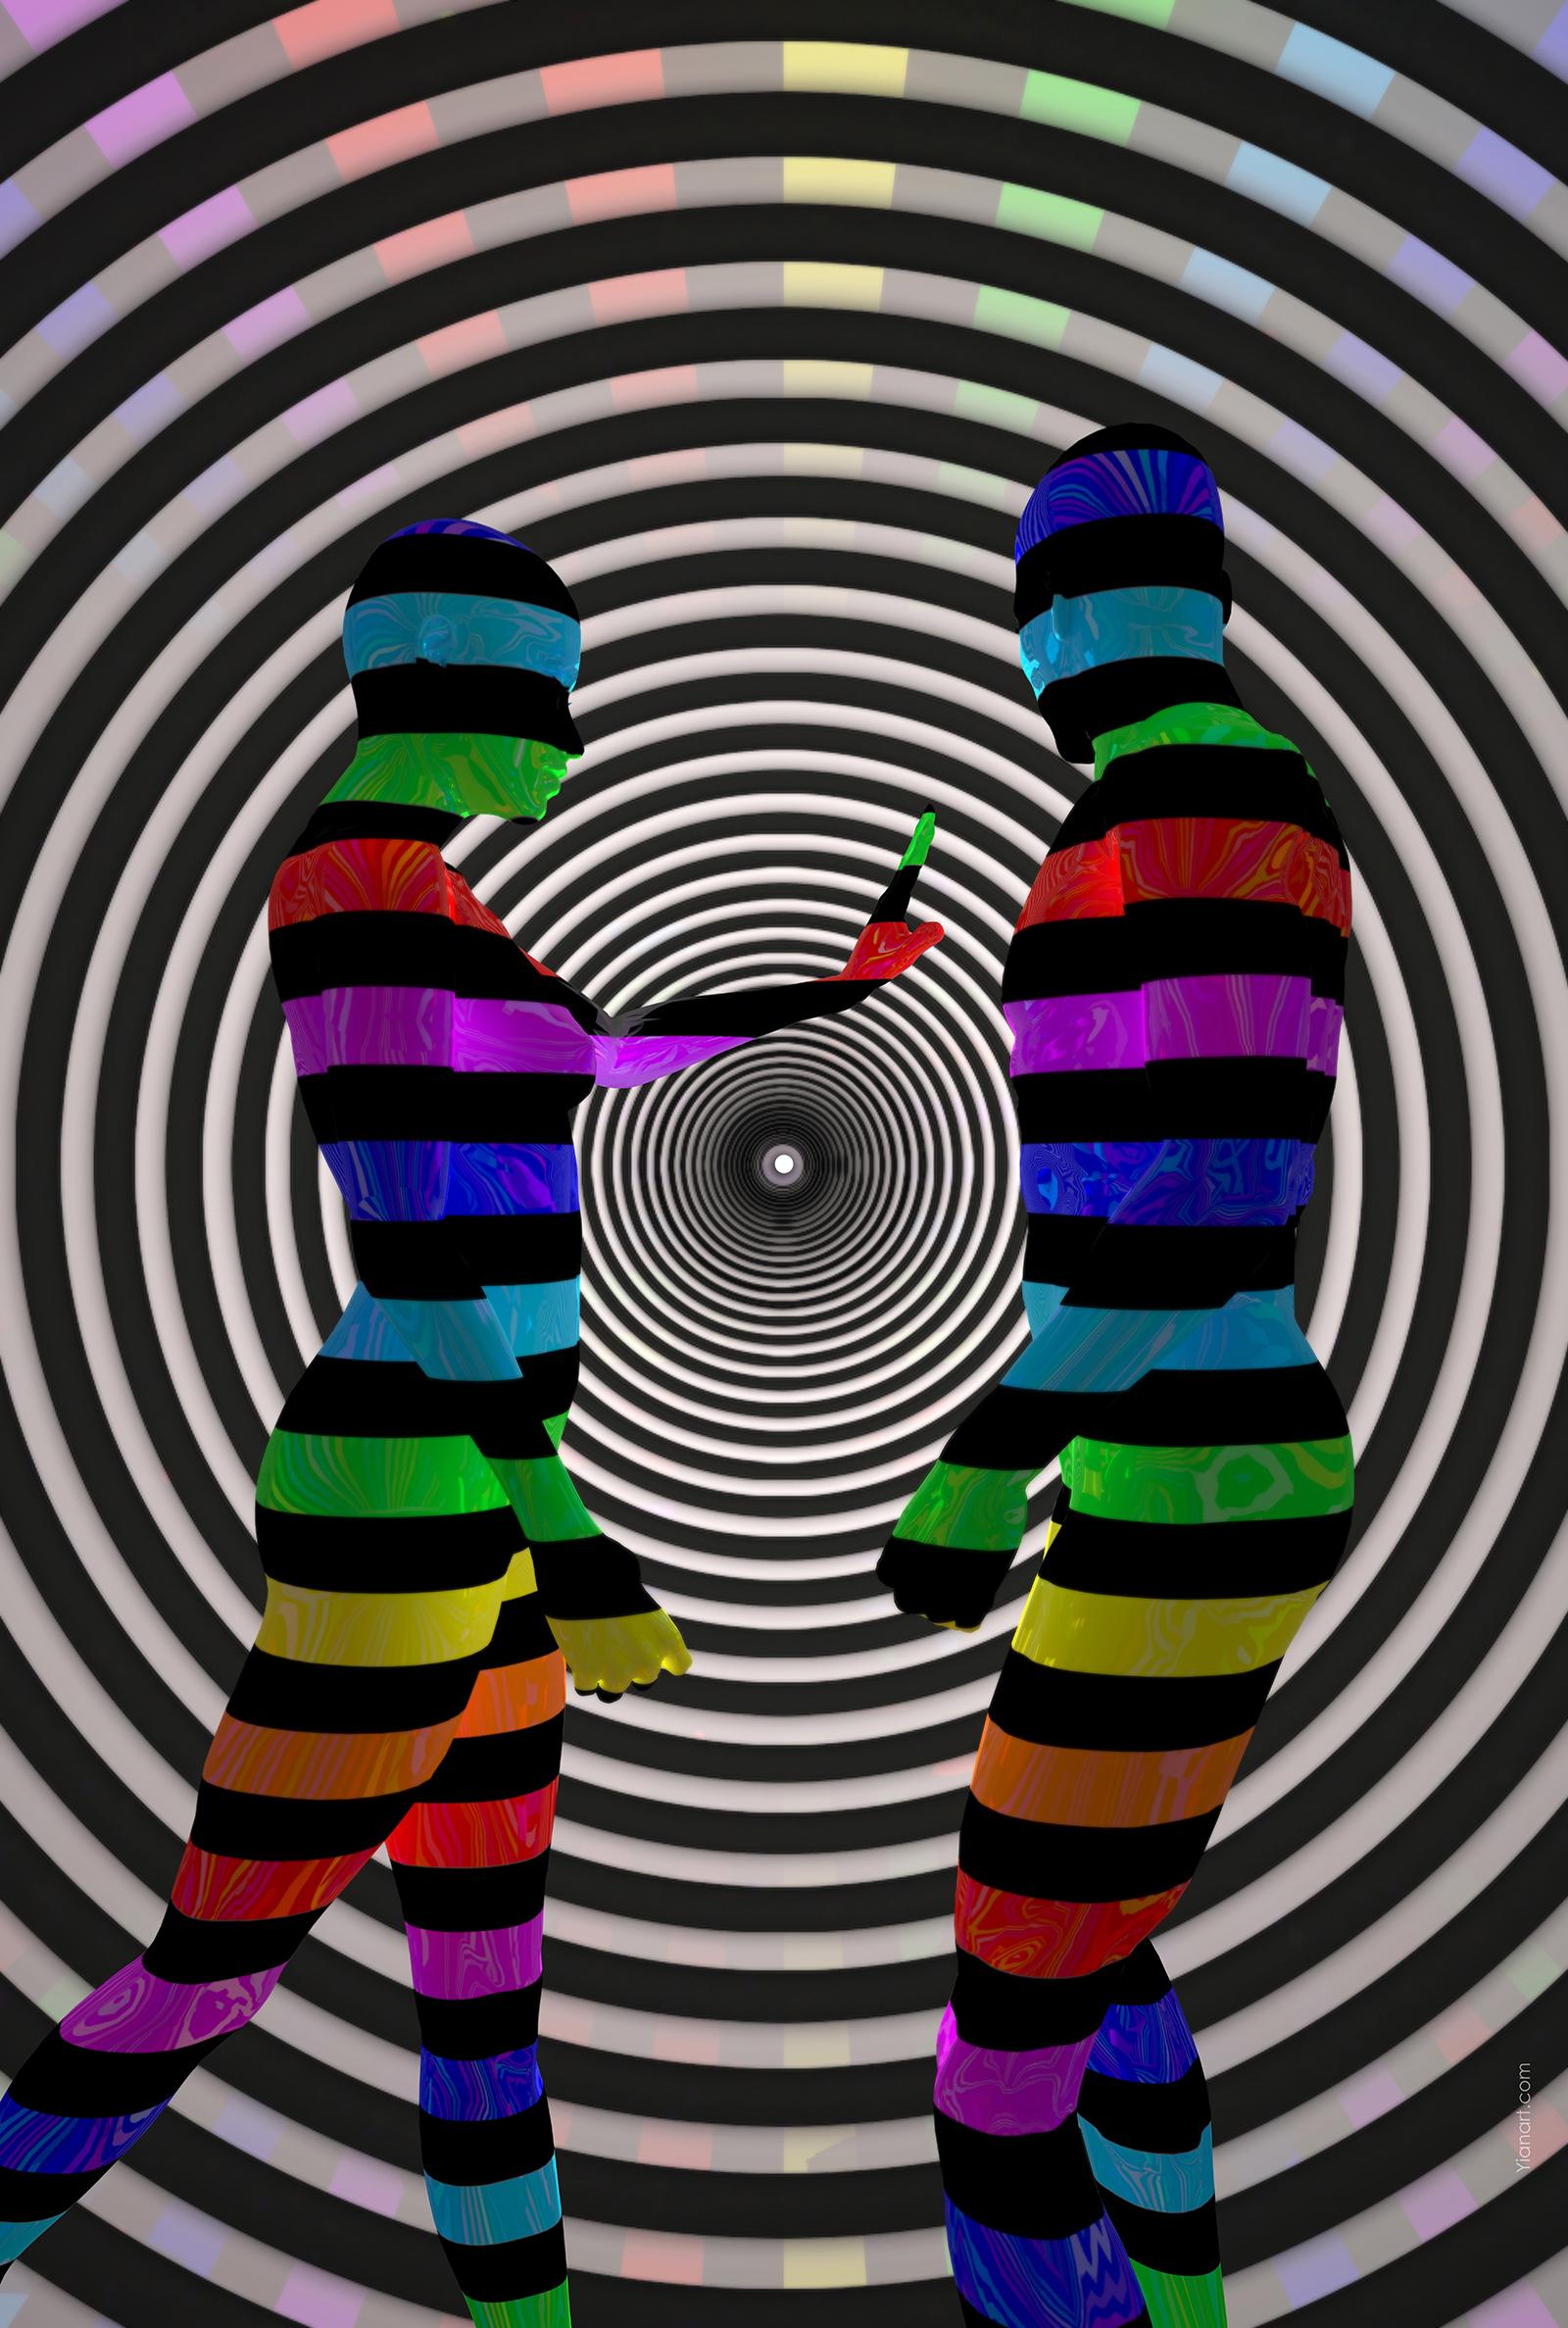 Dissension_3D Art Digital Design_Yianart